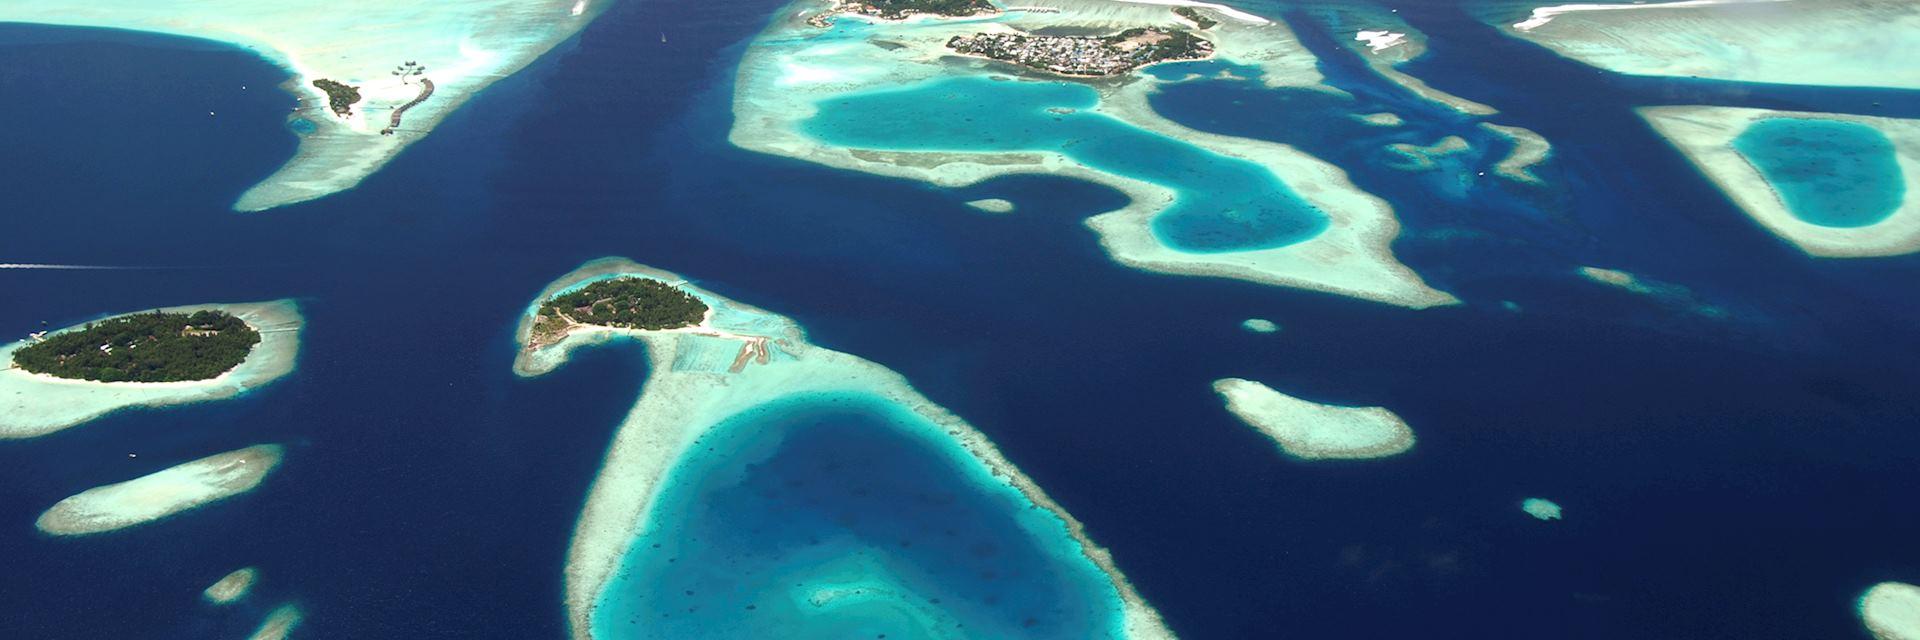 Atolls, the Maldives